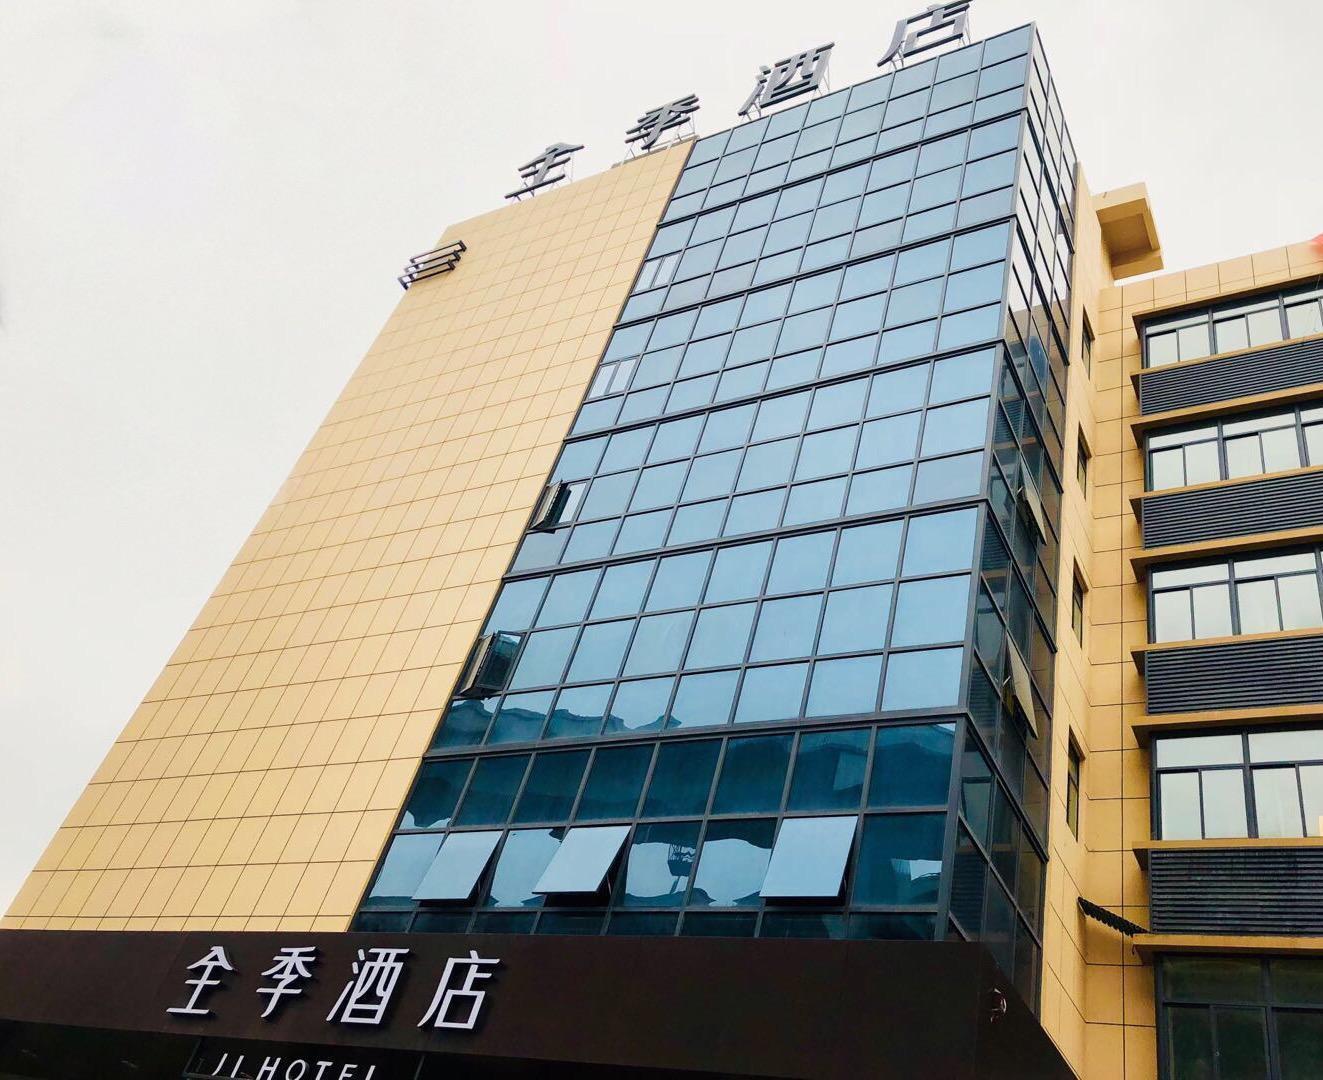 JI Hotel Shanghai Hongqiao National Exhibition and Convention Centre Huaxiang Road